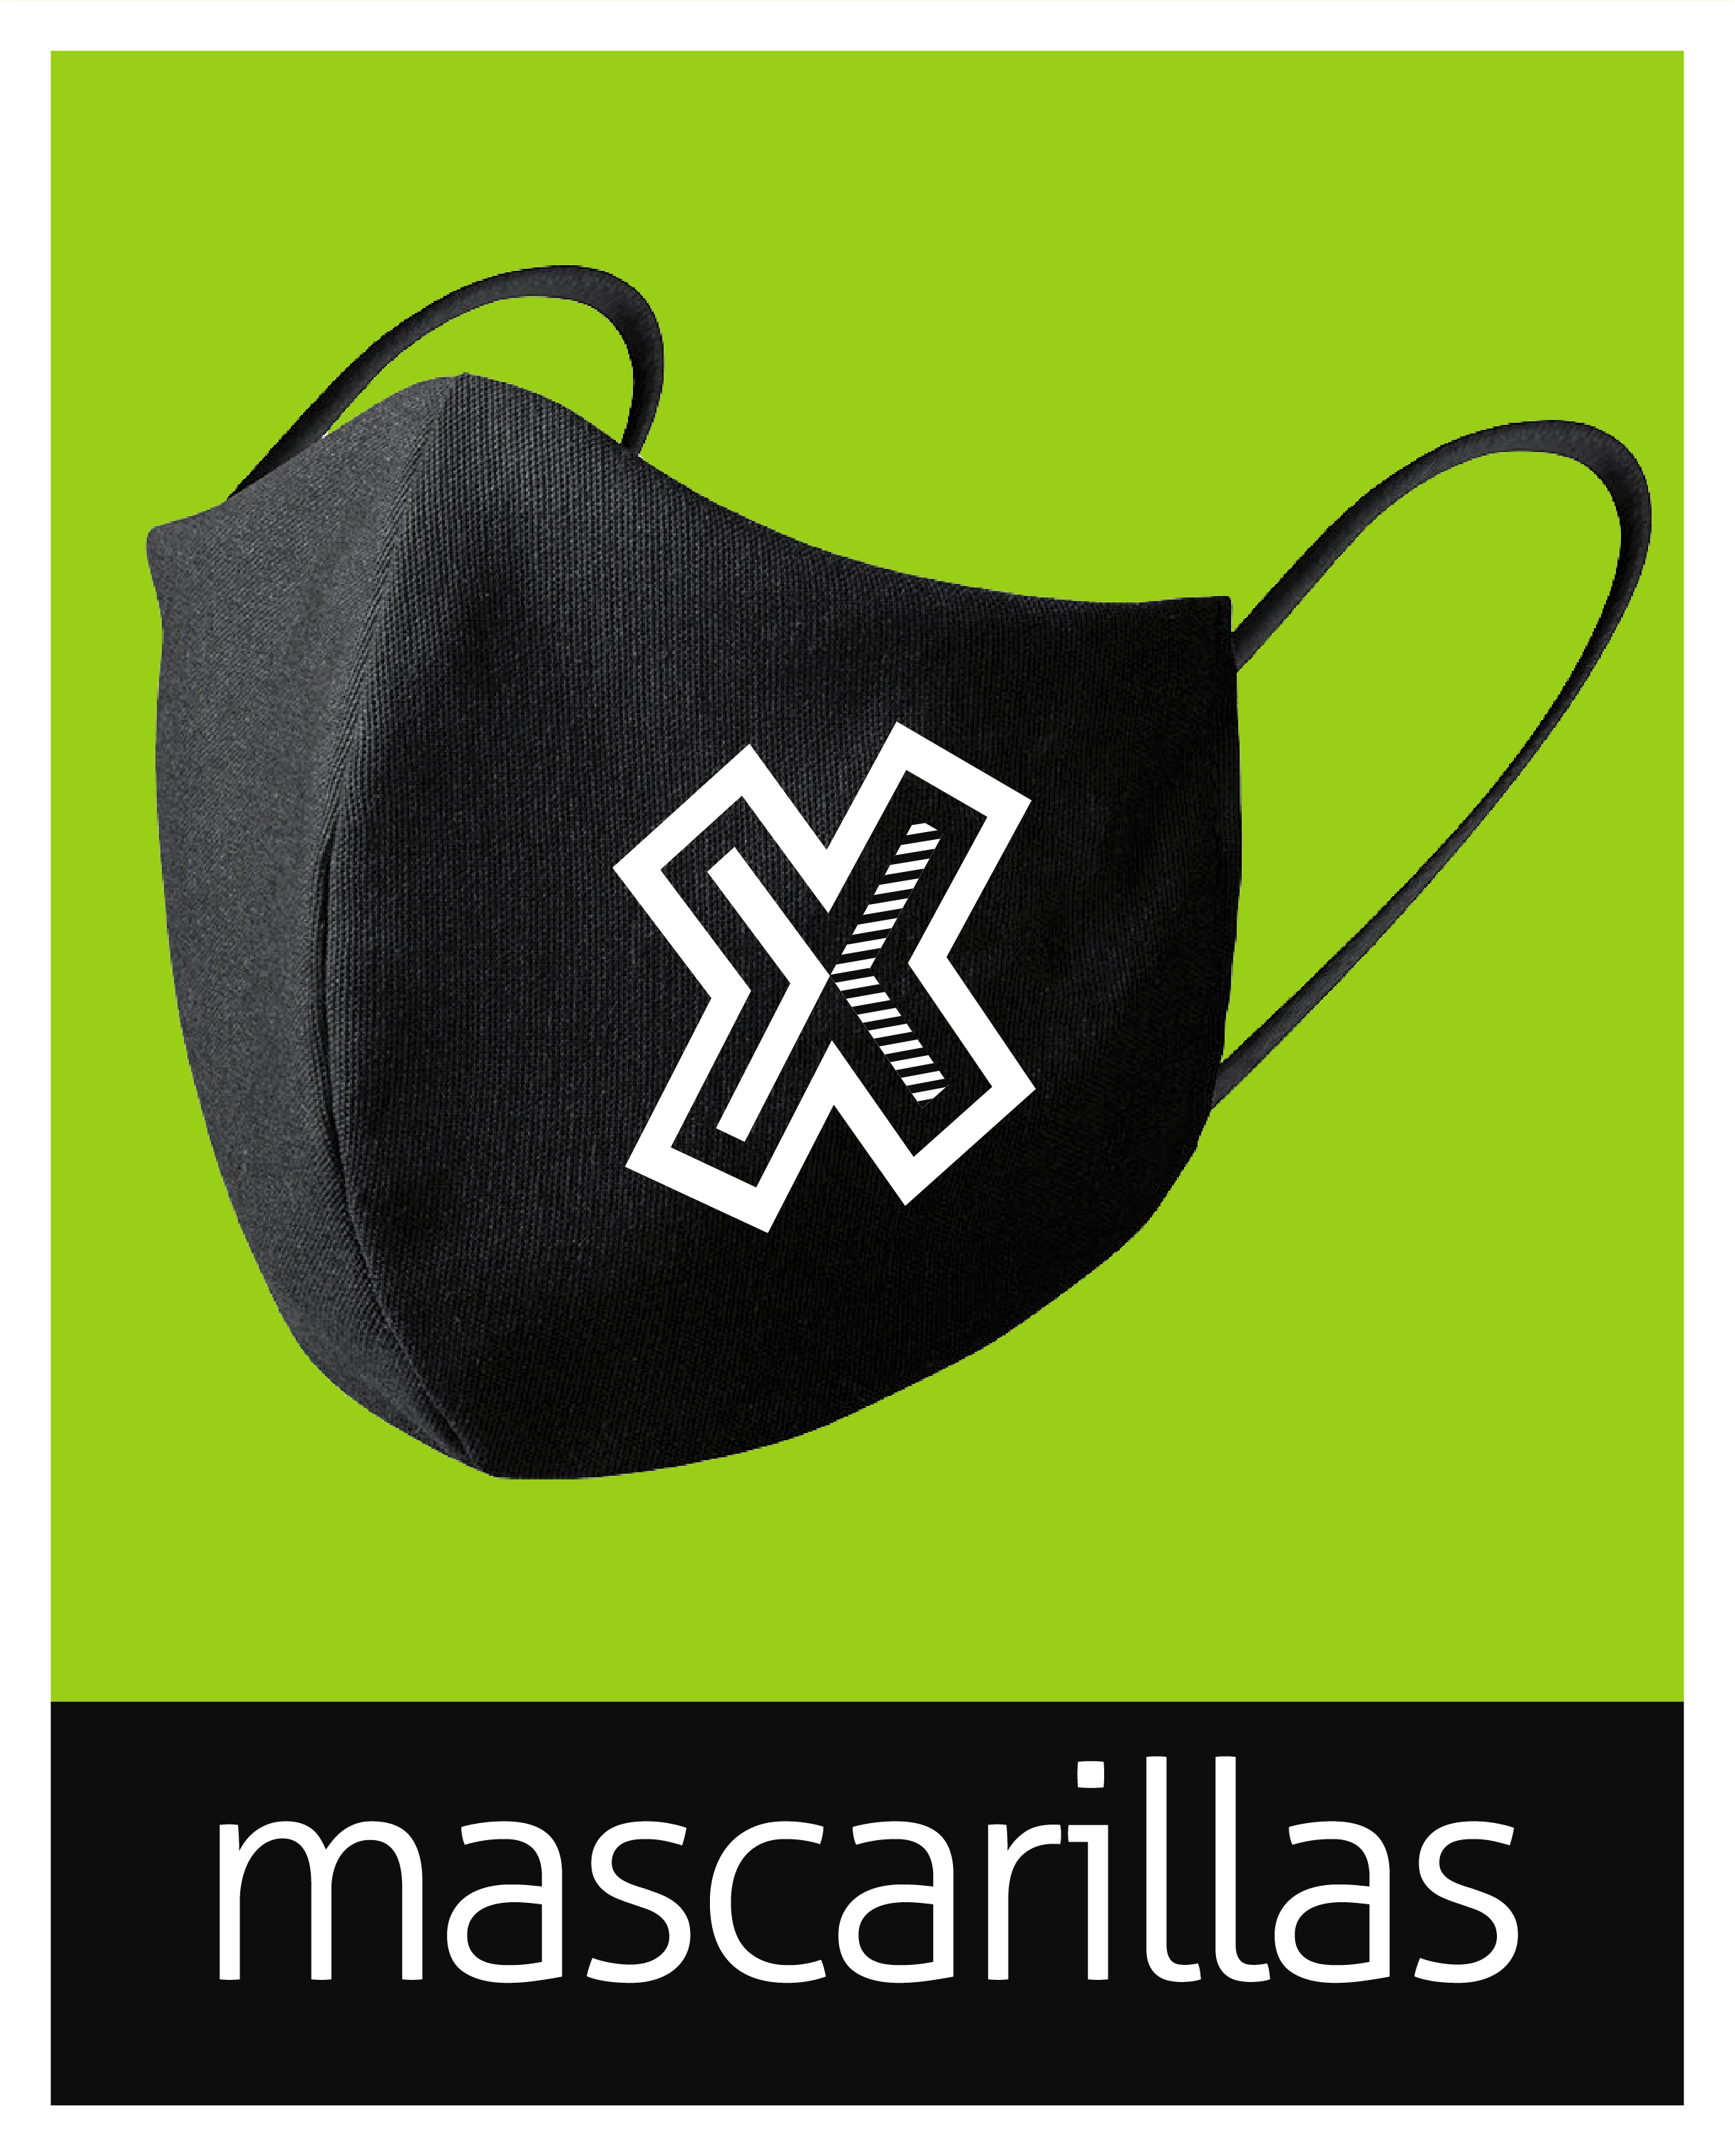 mascarillas.png